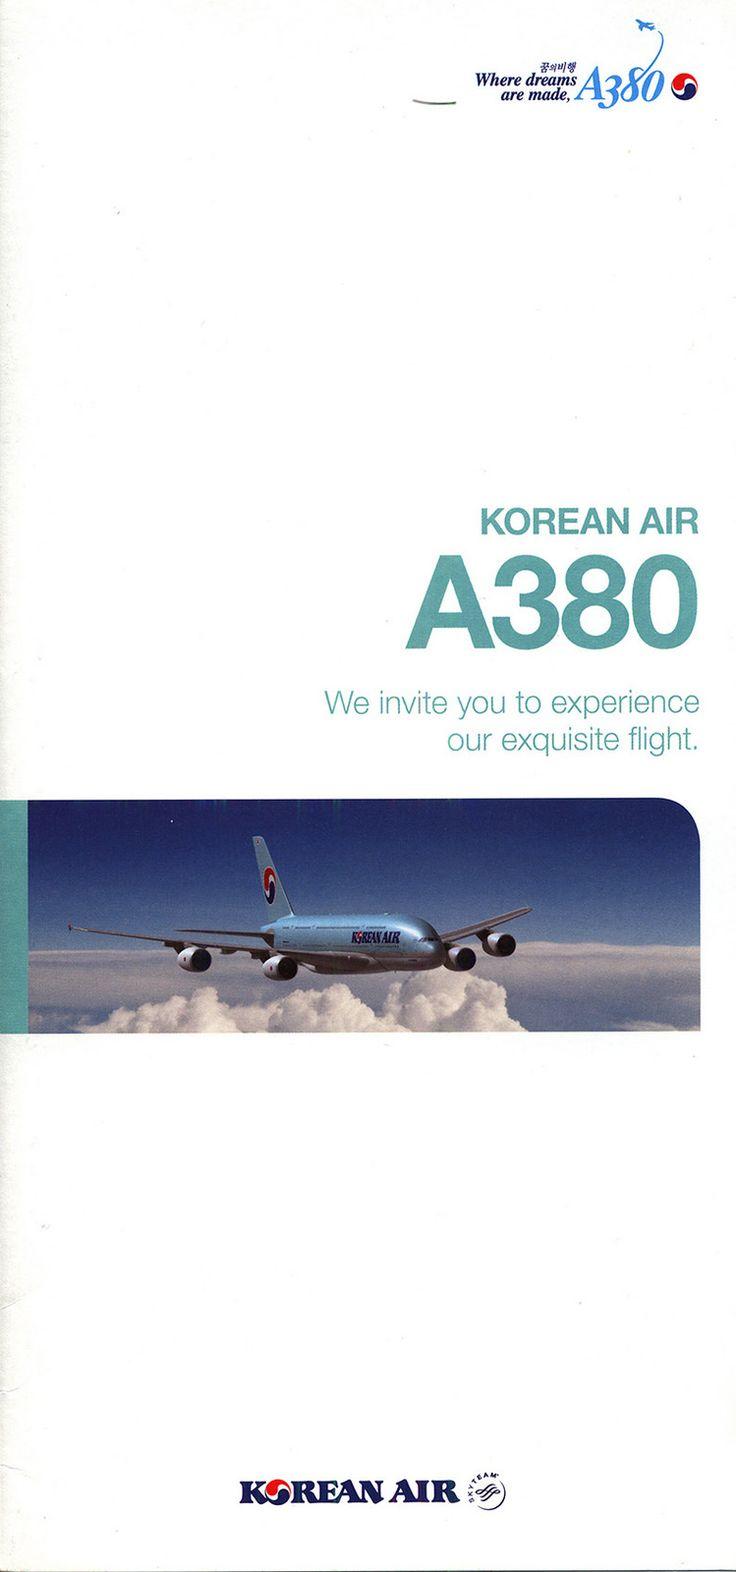 Pic my etihad pearl business class seat 9h on b777 300er may 2012 - Https Flic Kr P Hlbiae Korean Air A380